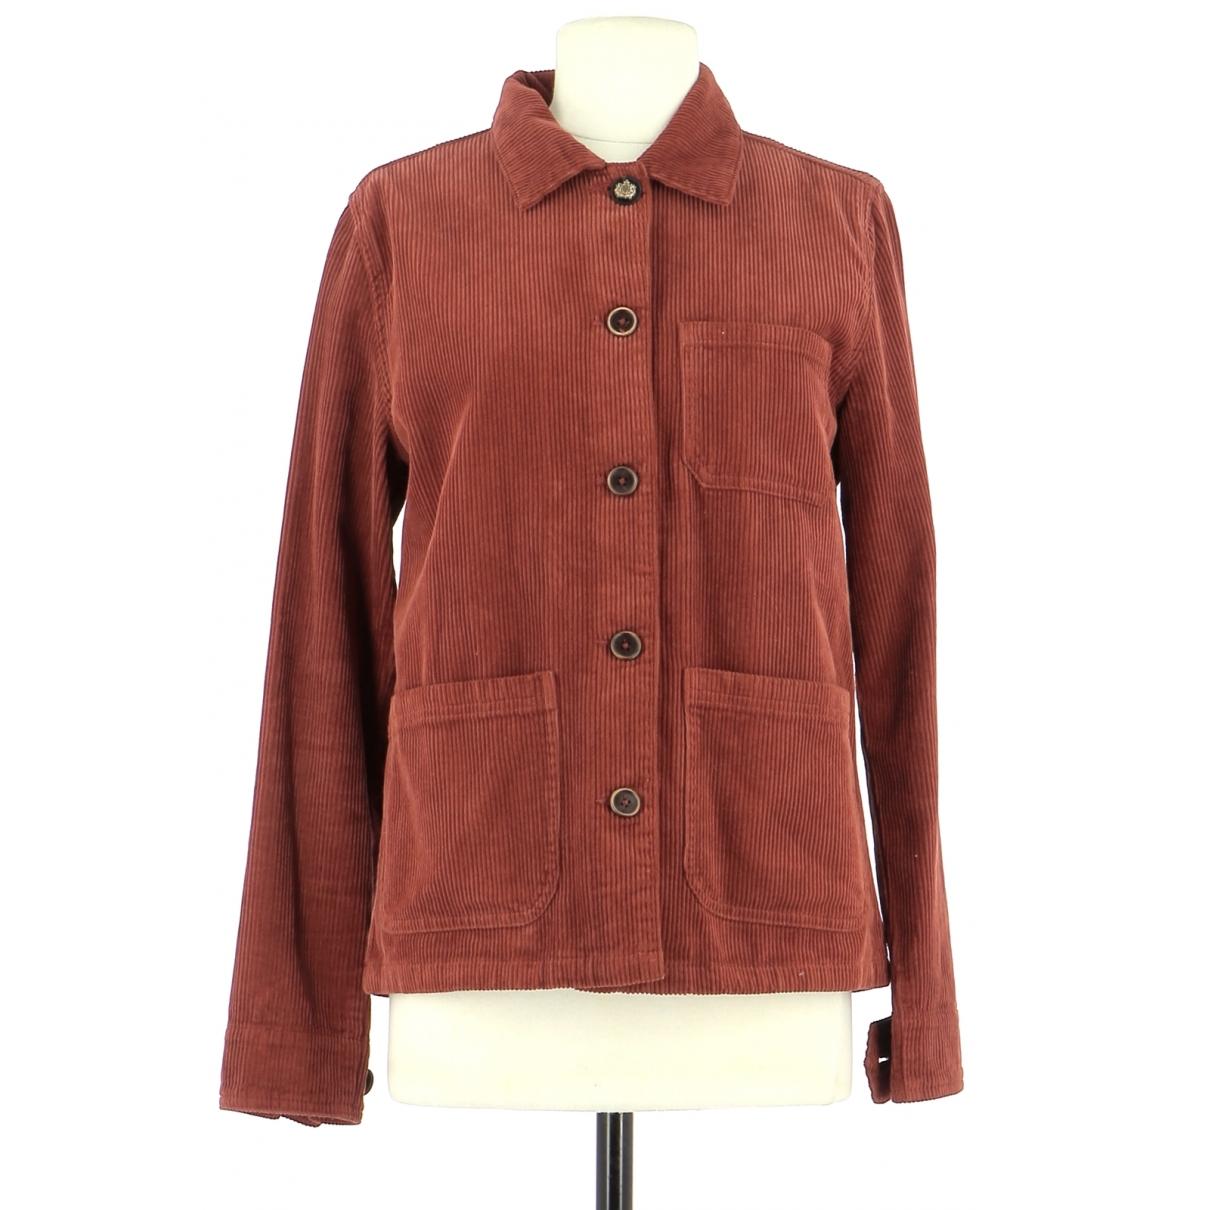 Mkt Studio \N Brown Cotton jacket for Women 36 FR